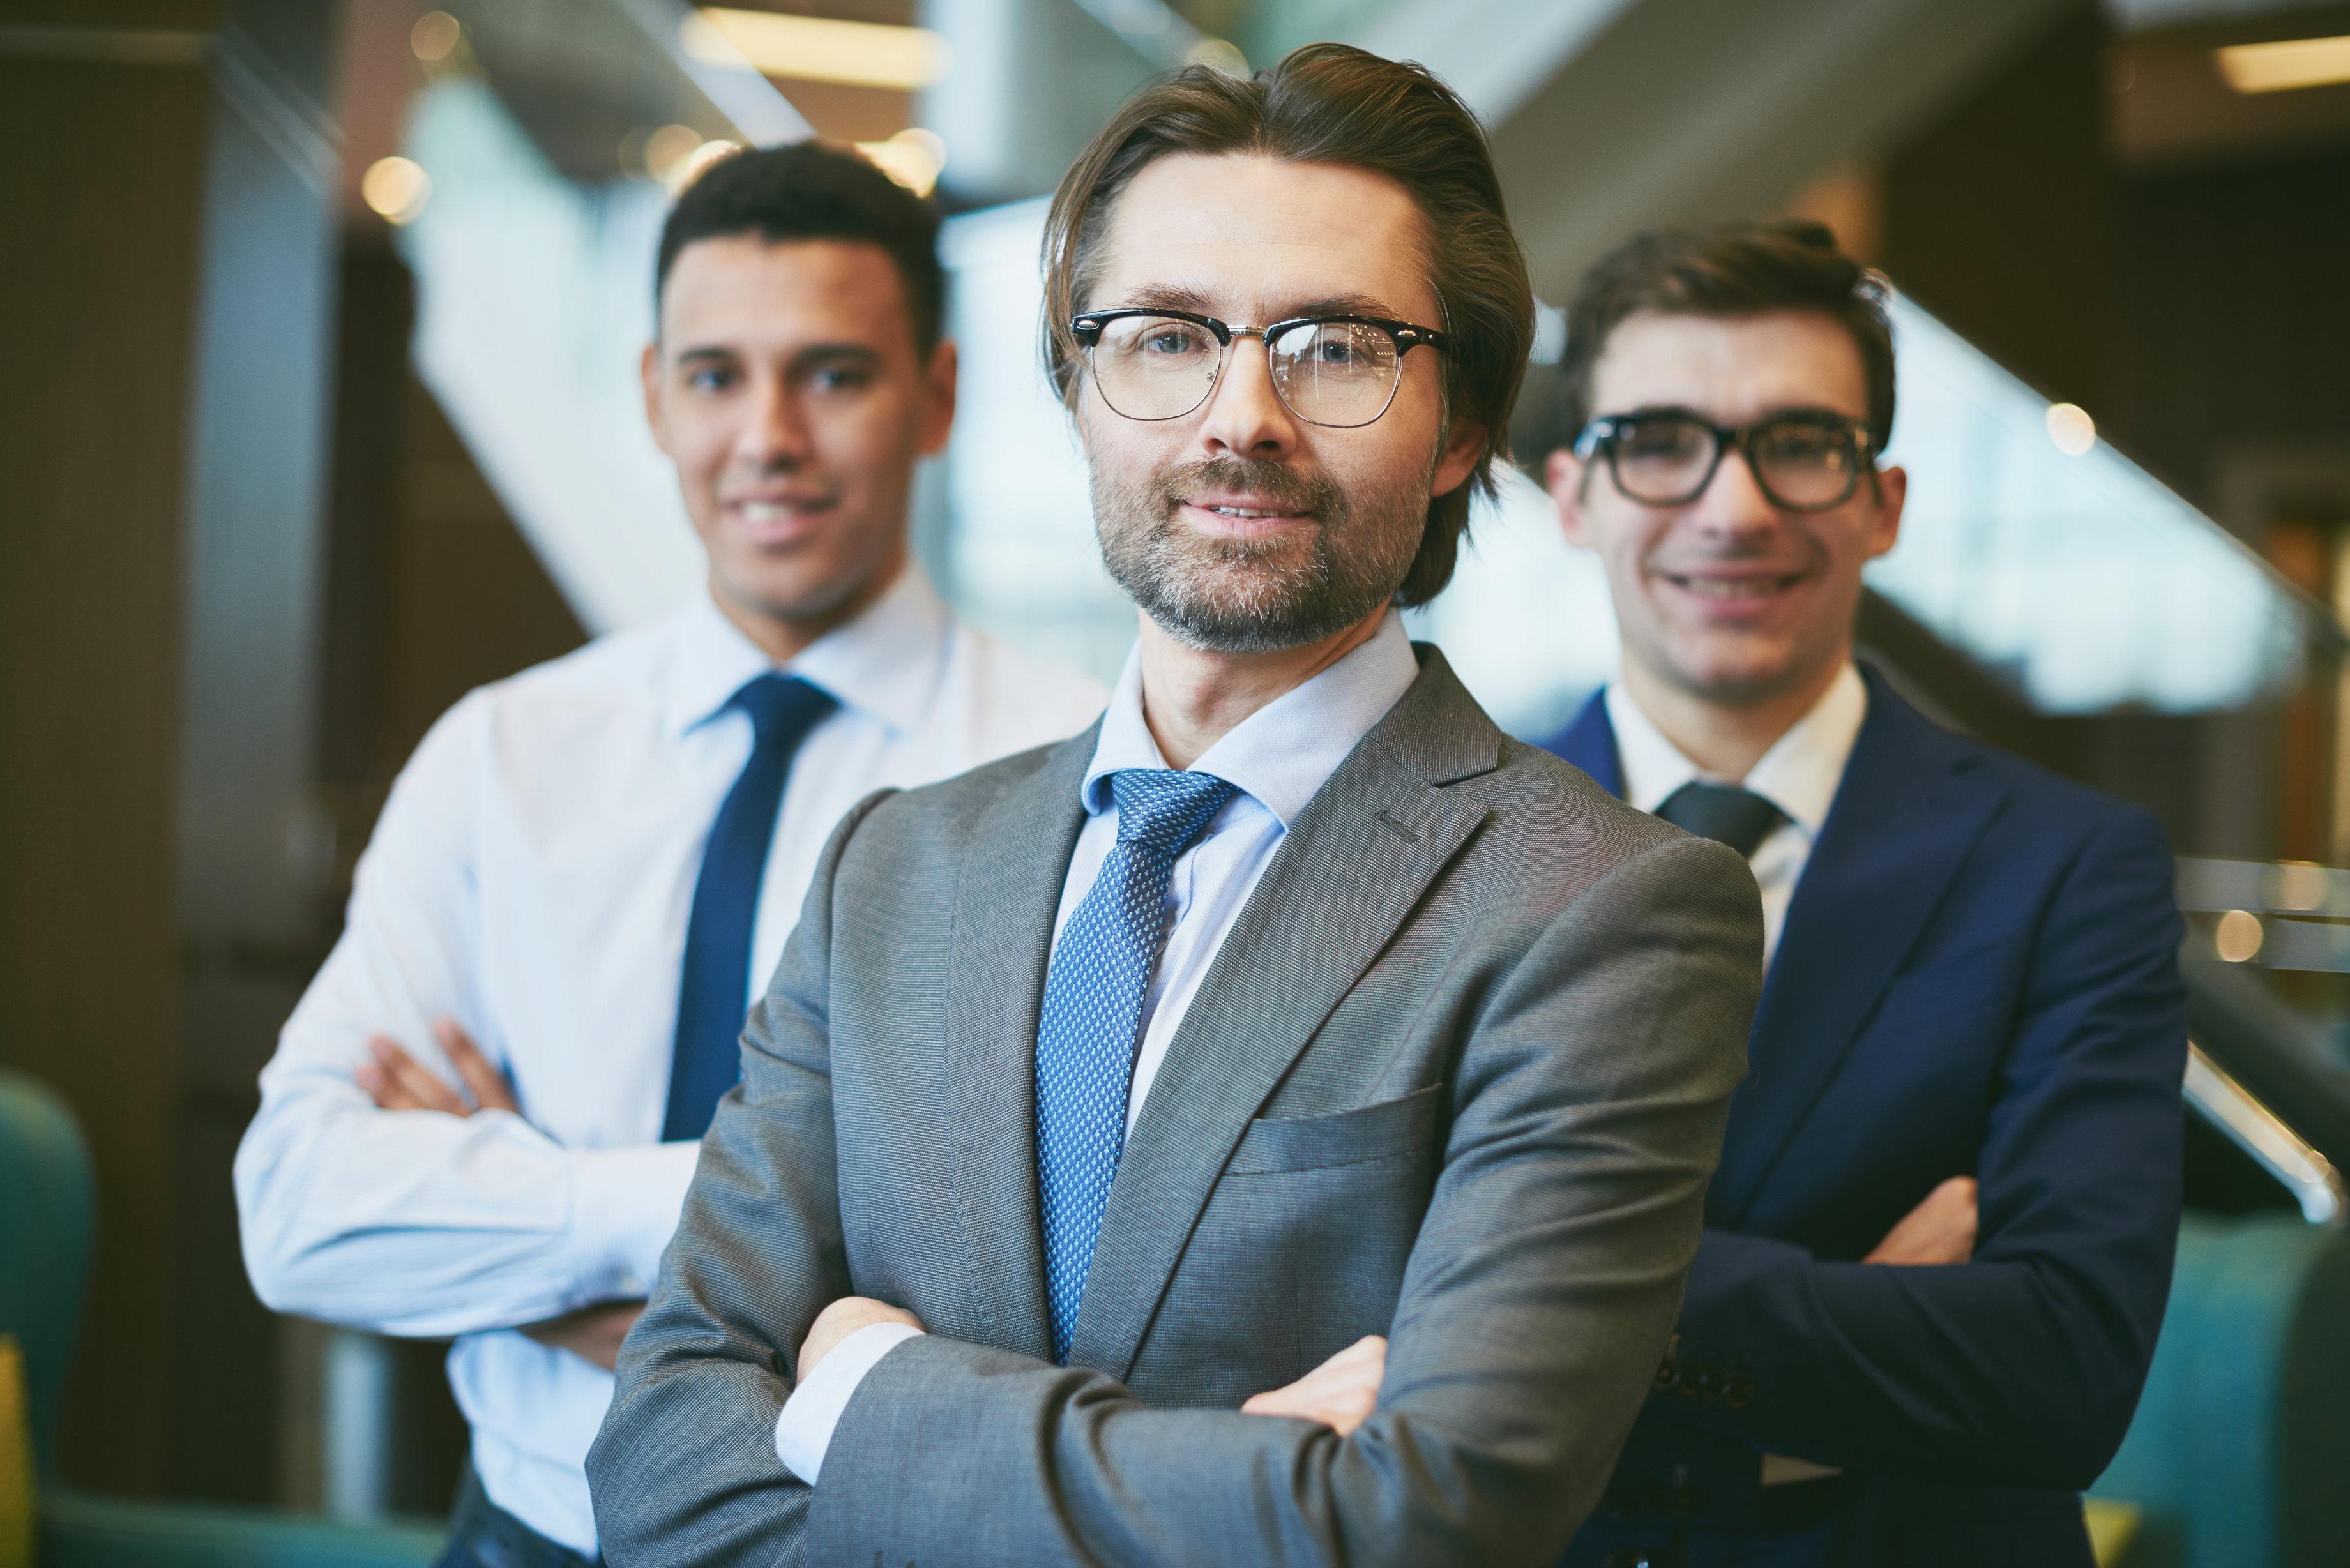 buenas-practicas-para-convertir-a-tu-empresa-en-employer-branding.jpg